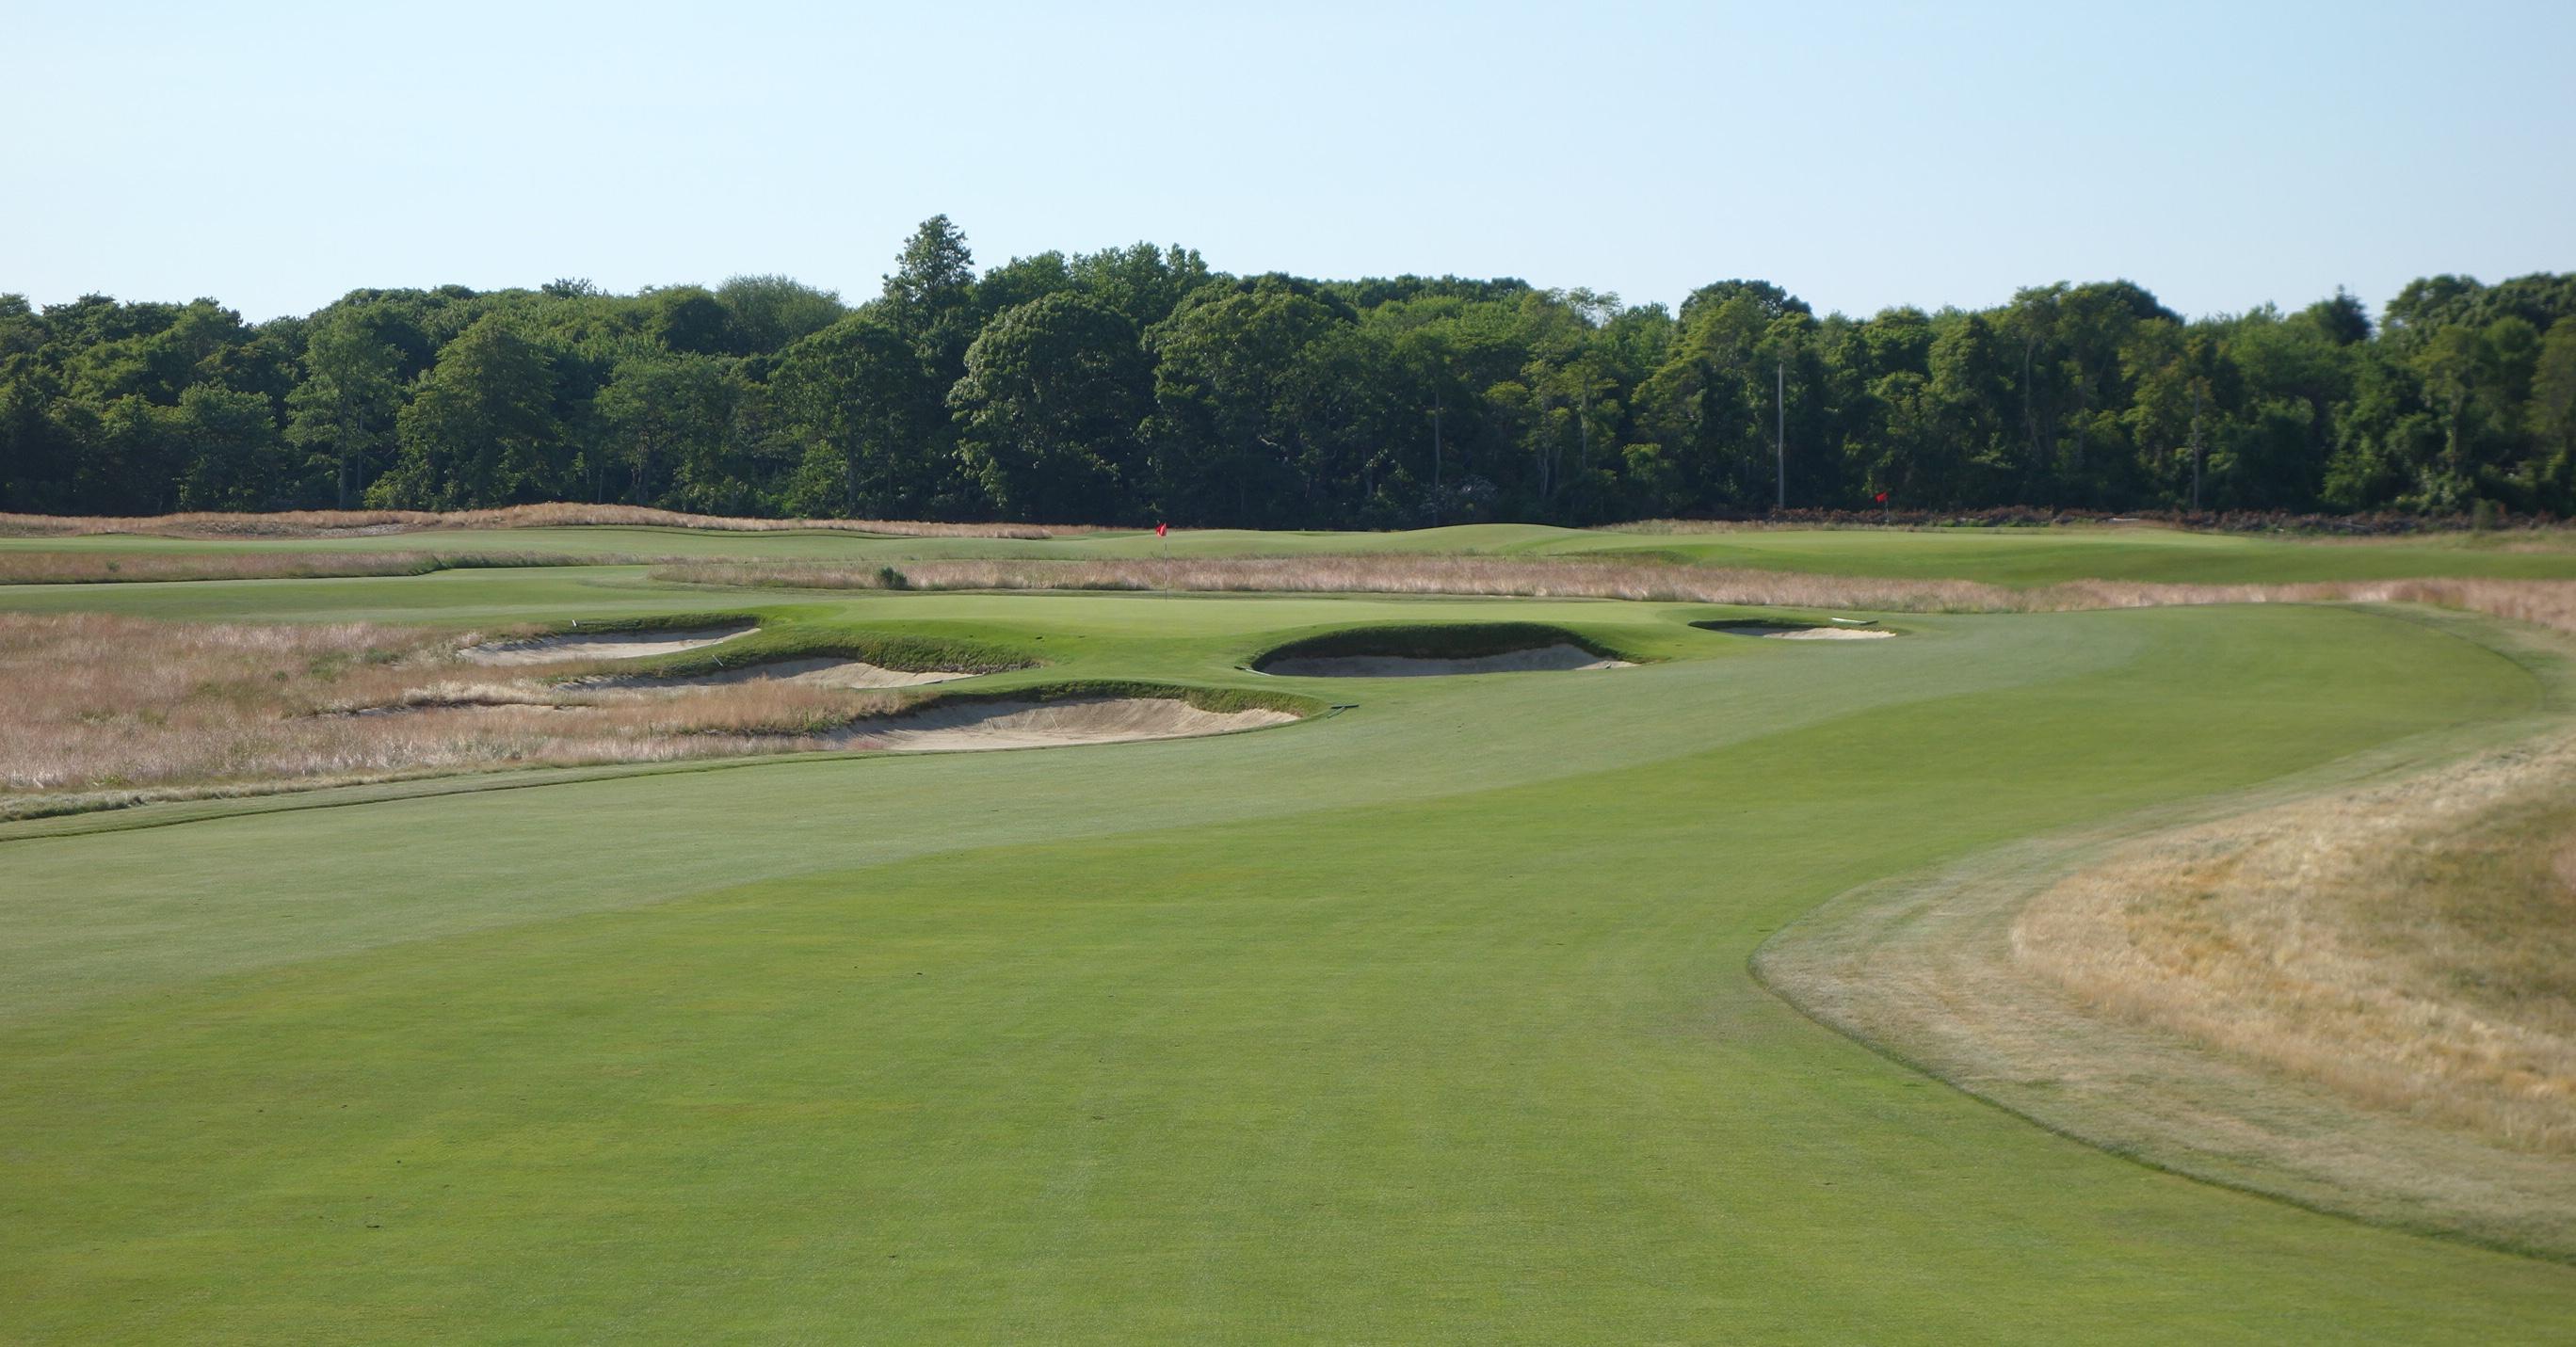 Shinnecock Hills Golf Club Review - Graylyn Loomis